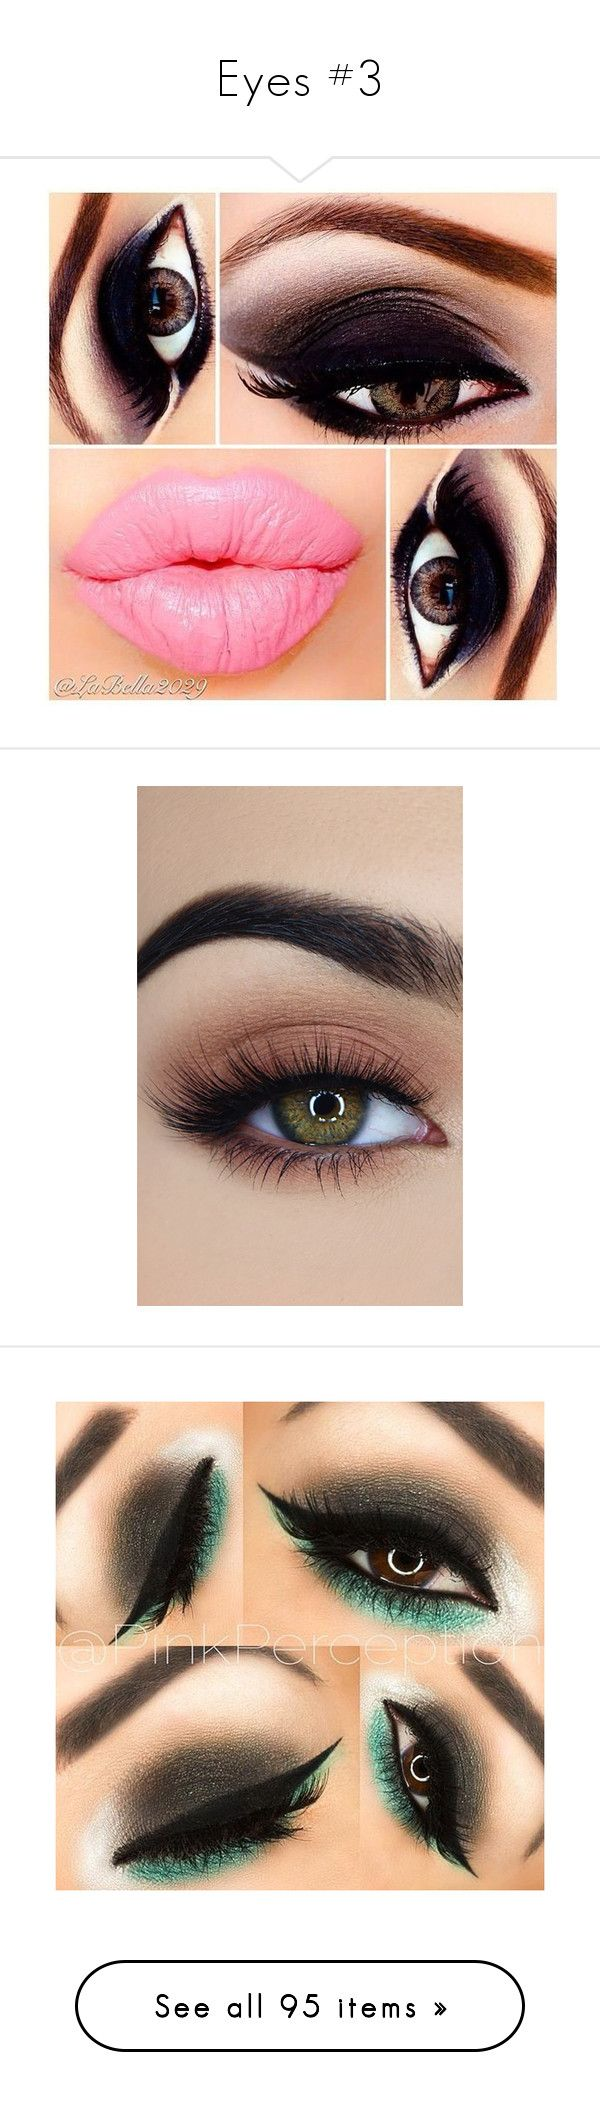 """Eyes #3"" by lu-ciminari49 ❤ liked on Polyvore featuring beauty products, makeup, eyes, lips, beauty, eye makeup, false eyelashes, faces, black and eyeshadow"